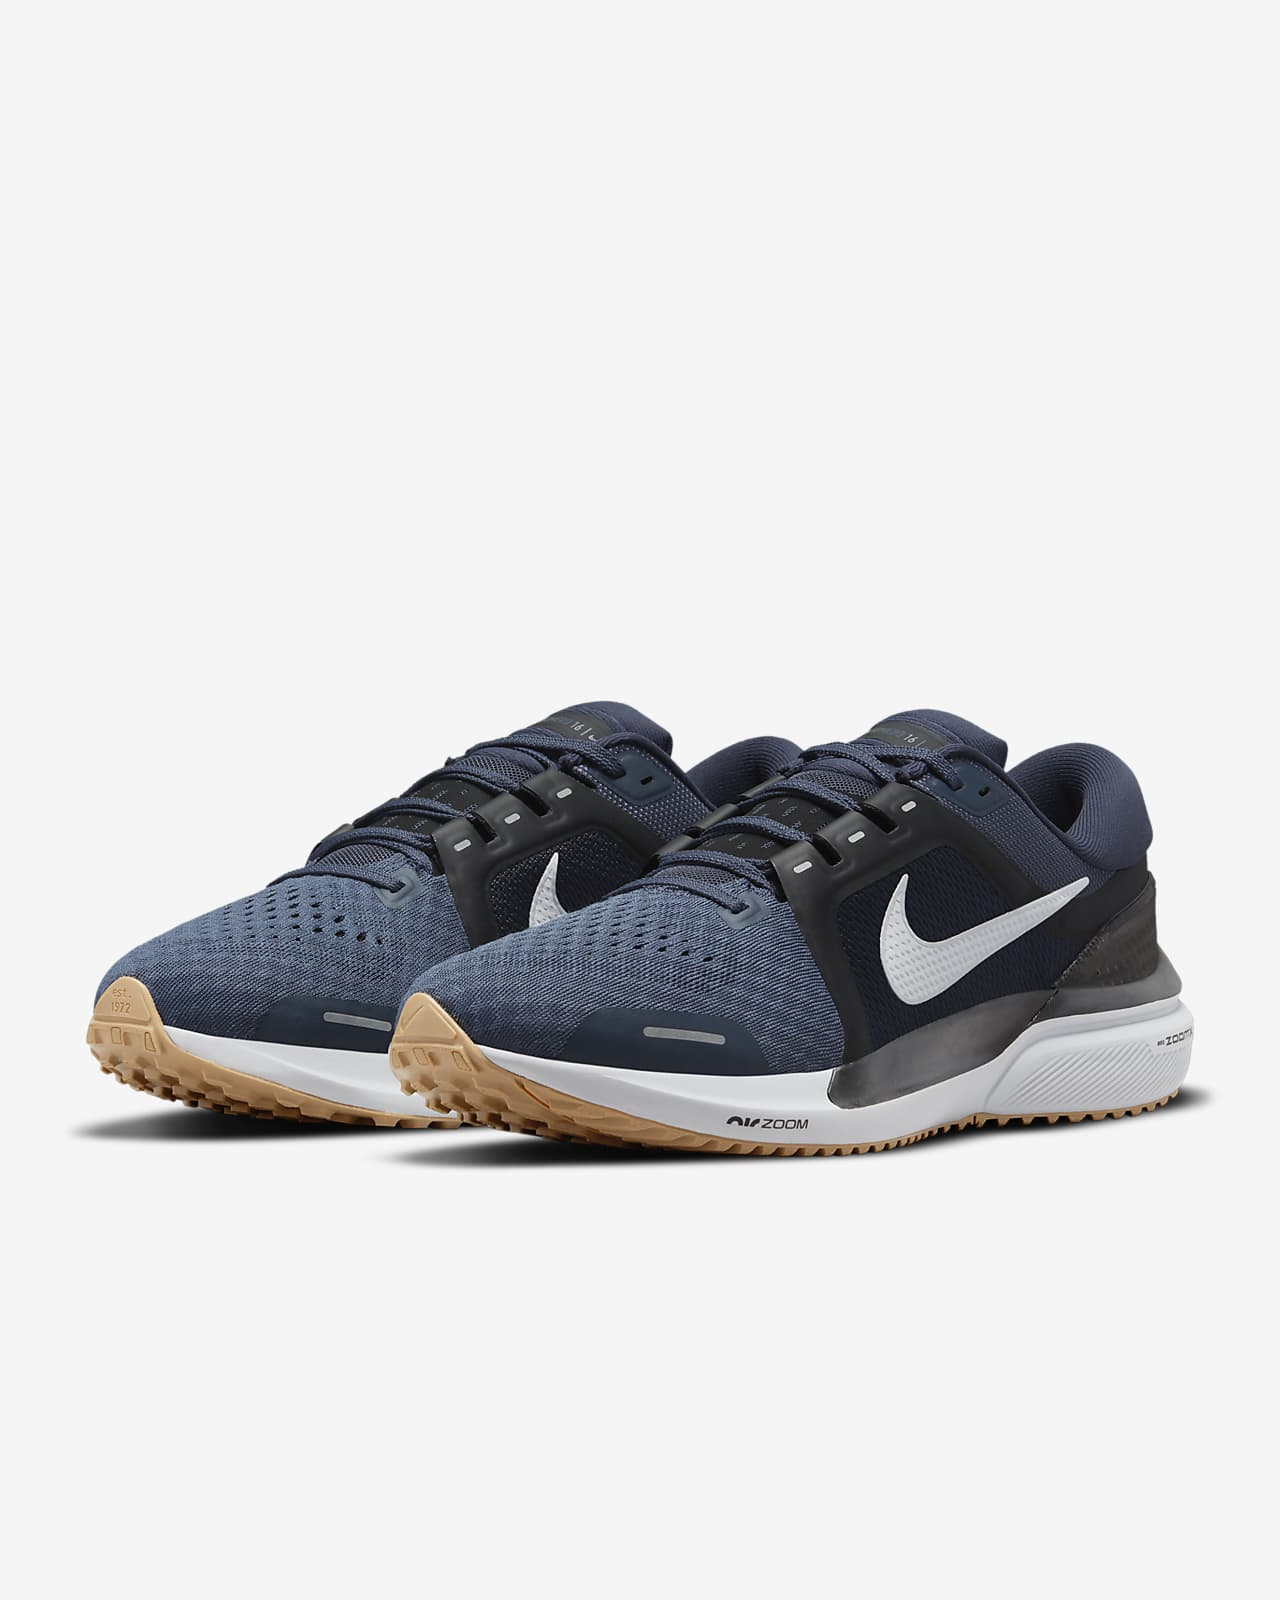 Nike Air Zoom Vomero 16 Men's Road Running Shoes. Nike.com